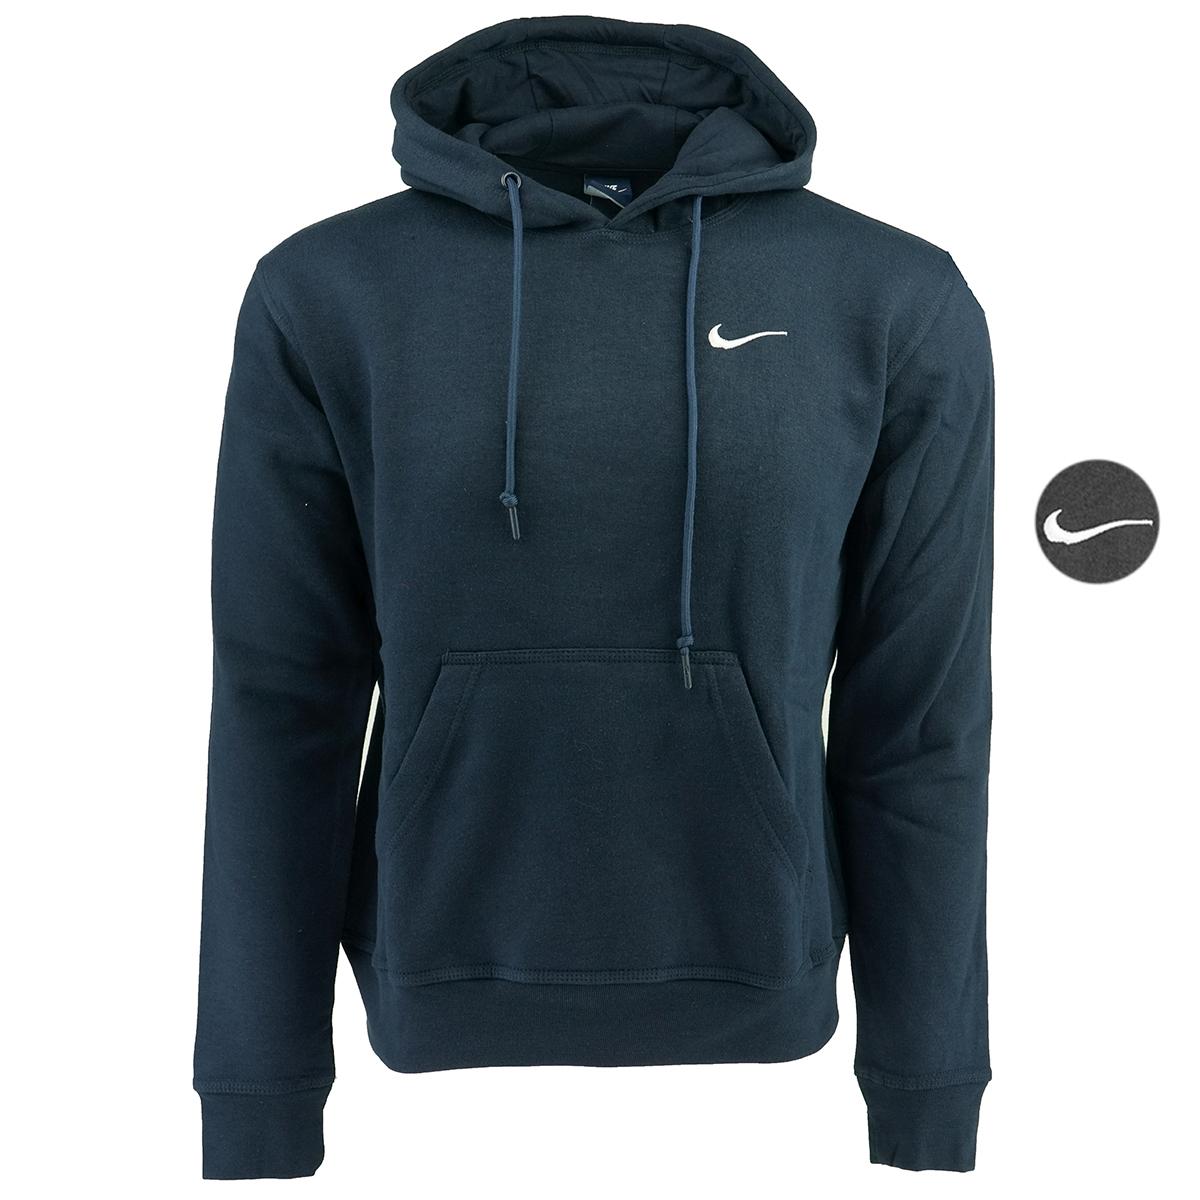 225a005662c0 Nike Men s Fundamental Fleece Hoodie Black White S